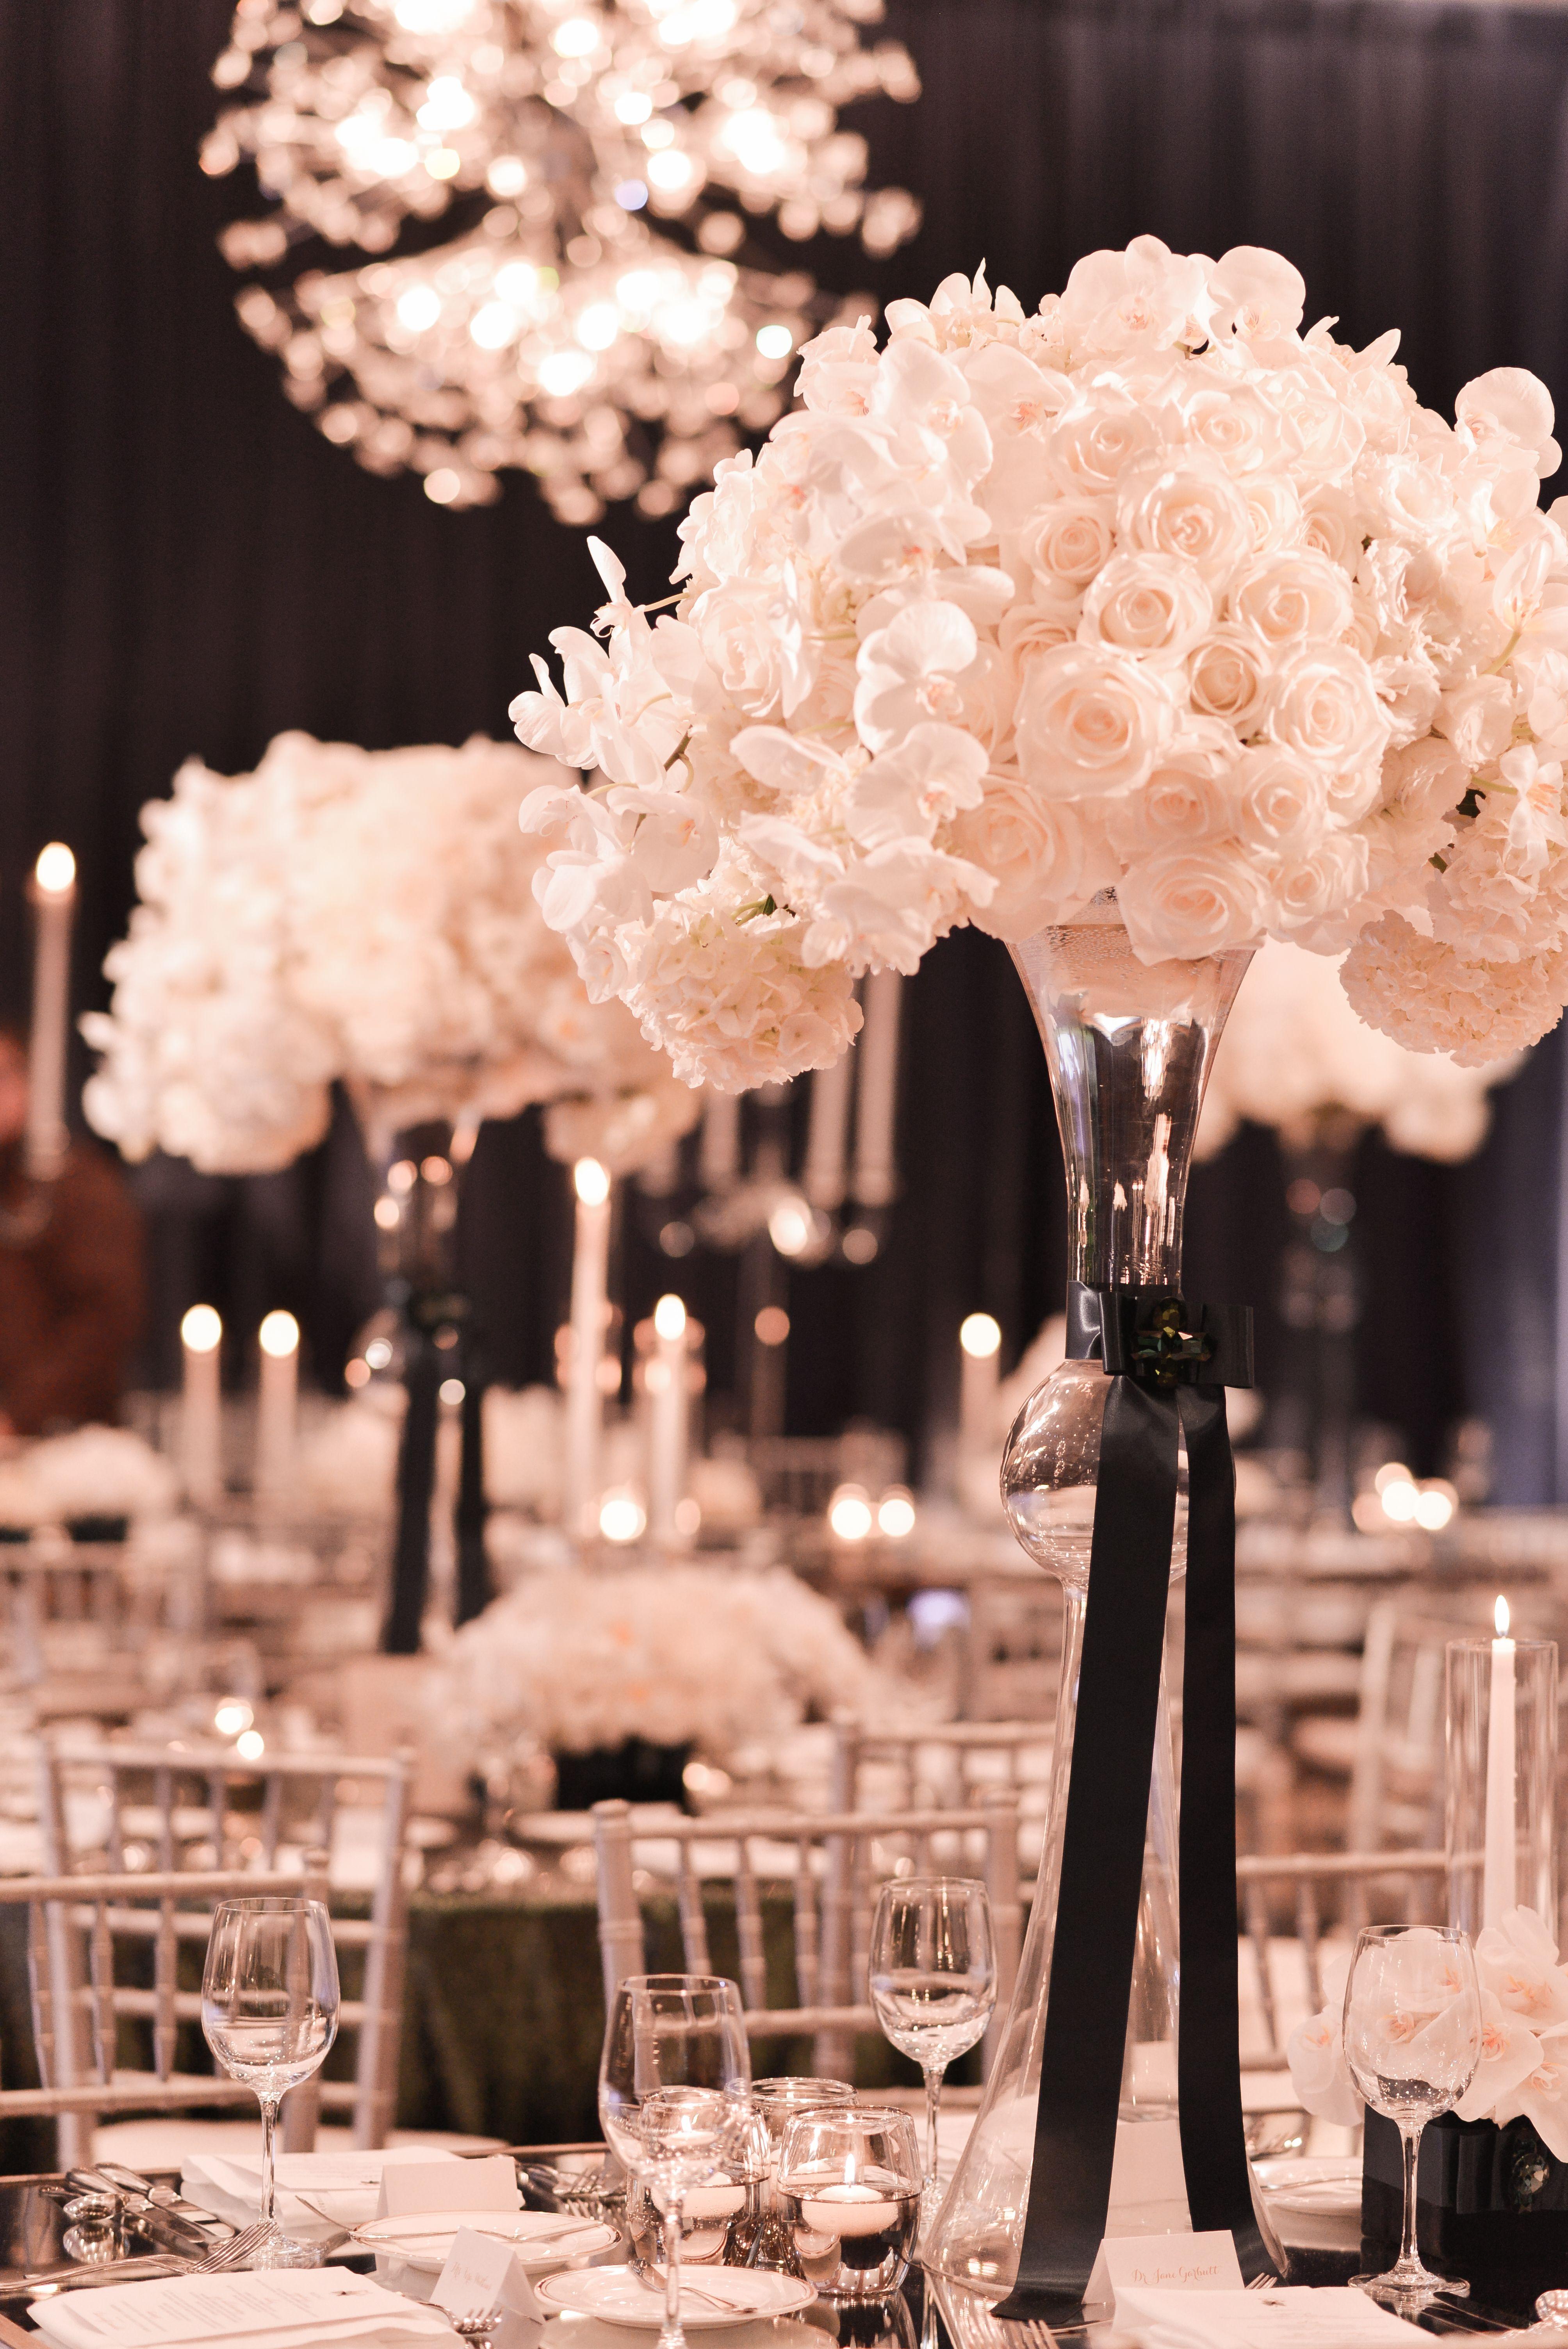 Black and white wedding decor ideas  White and Black Ribbon Tie on Vaset n Black but wedding color